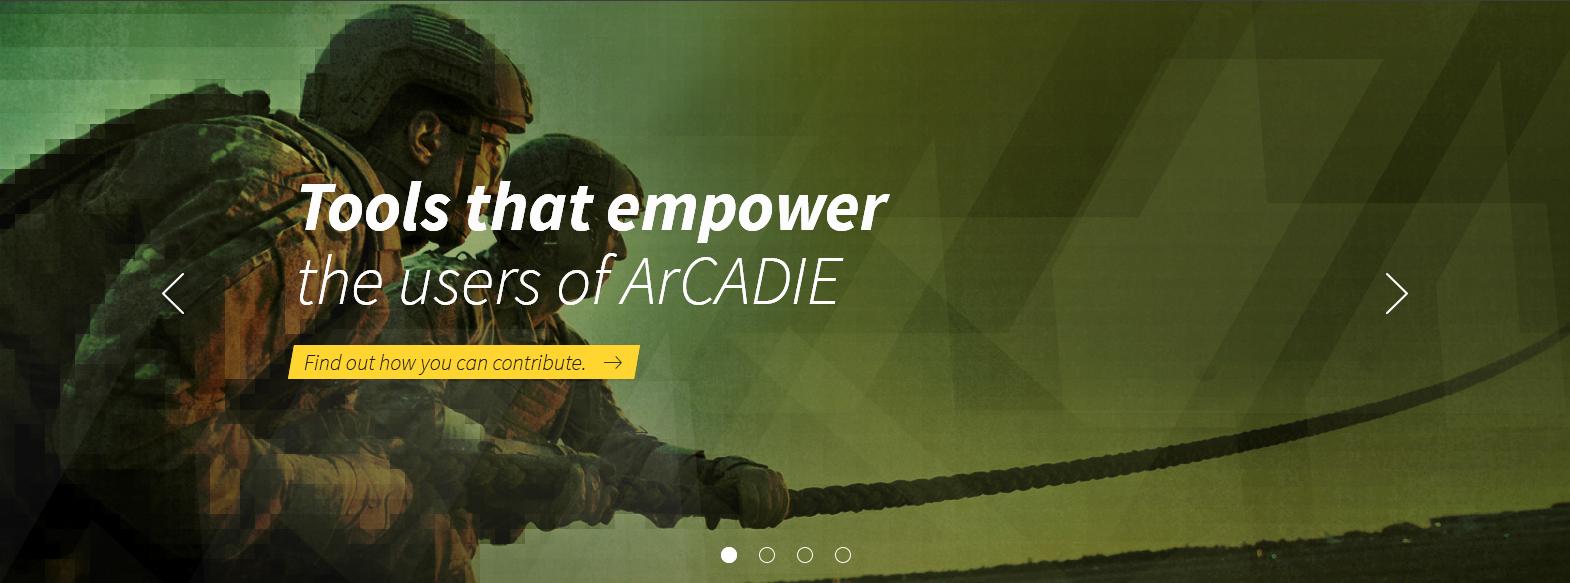 ArCADIE Banner 1